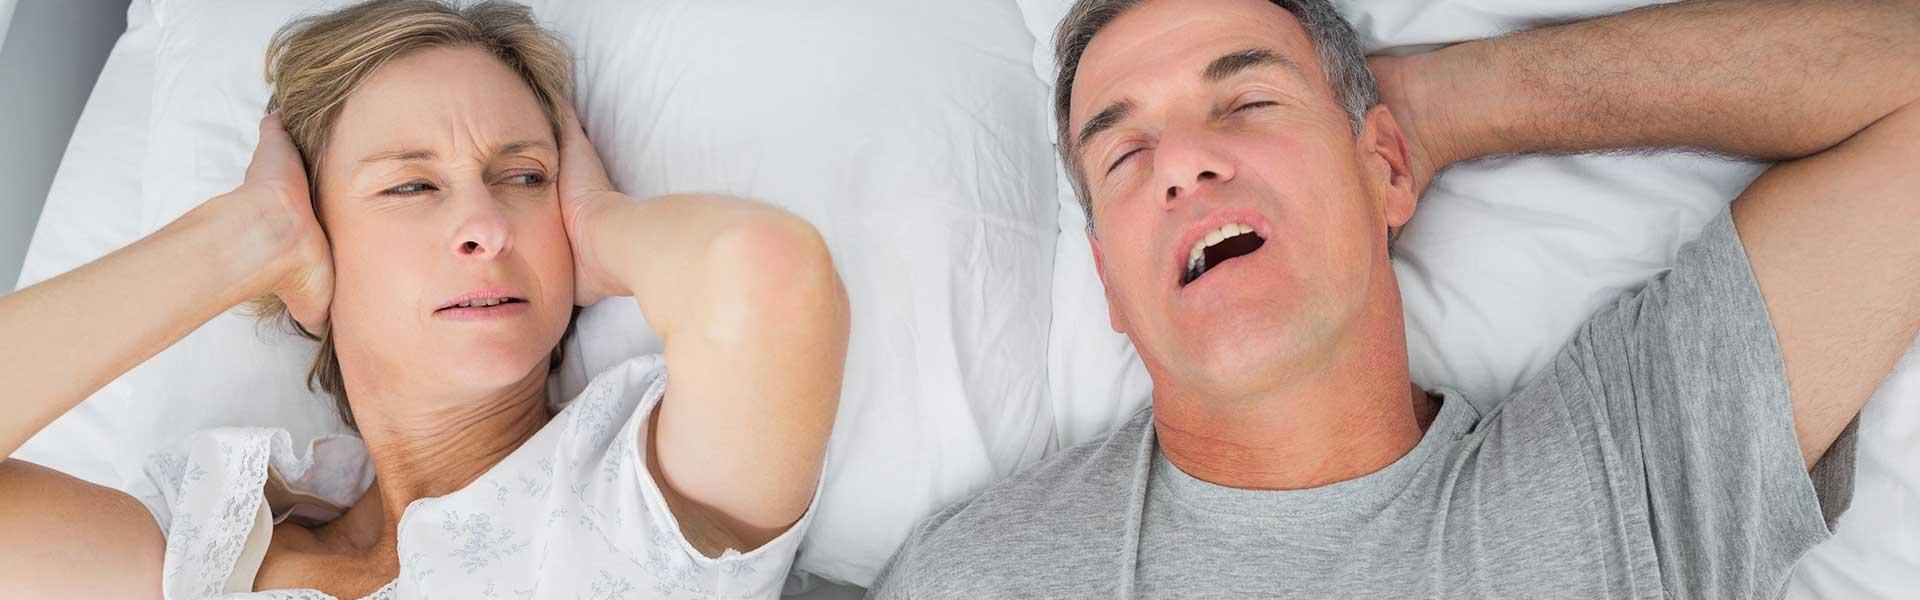 NE Calgary Sleep Apnea Treatment | Pathways Dental Clinic